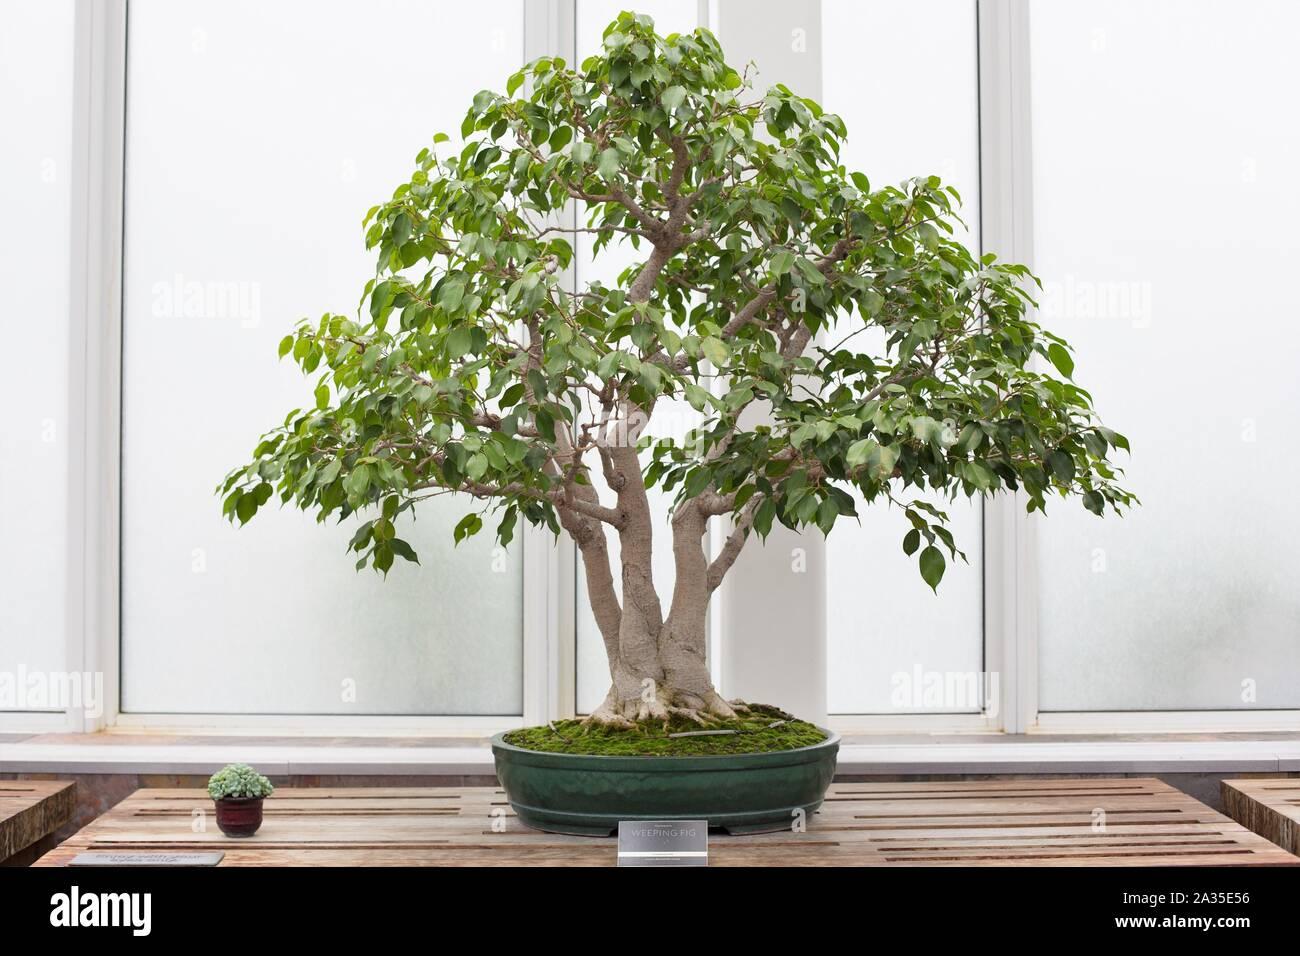 Bonsai Tree Ficus Benjamina High Resolution Stock Photography And Images Alamy